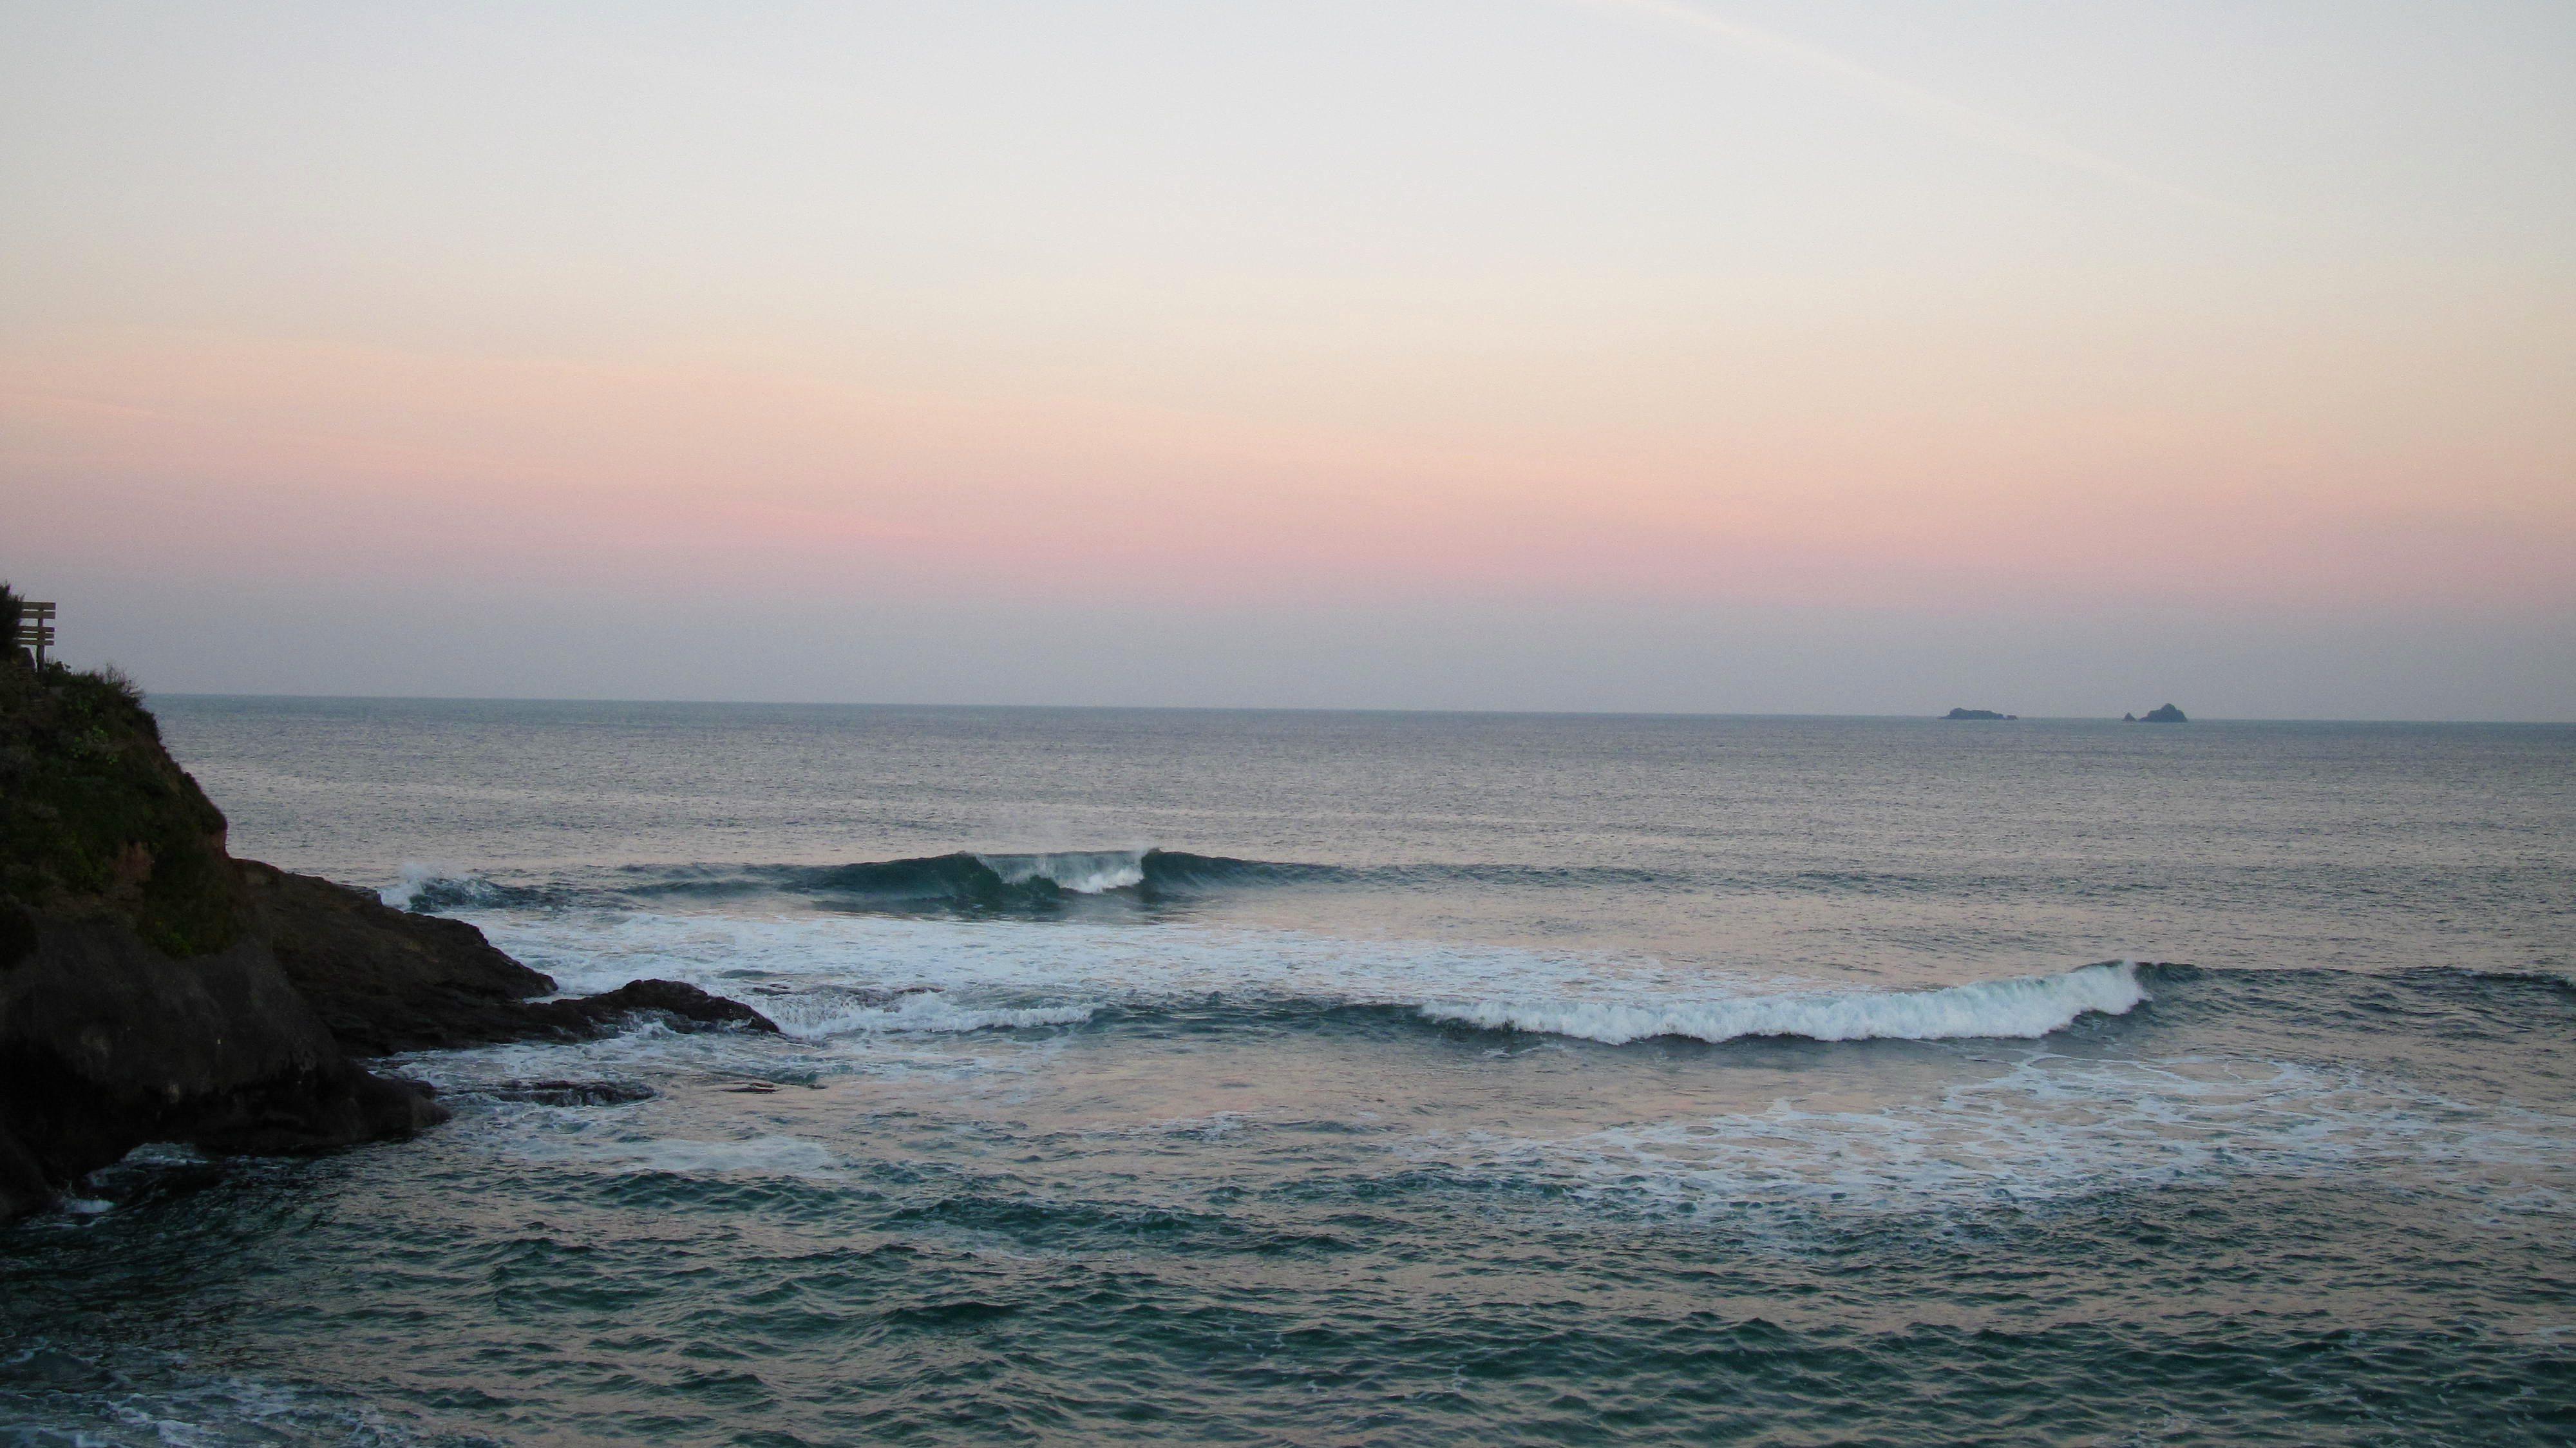 Surf Report for Wednesday 30th September 2015